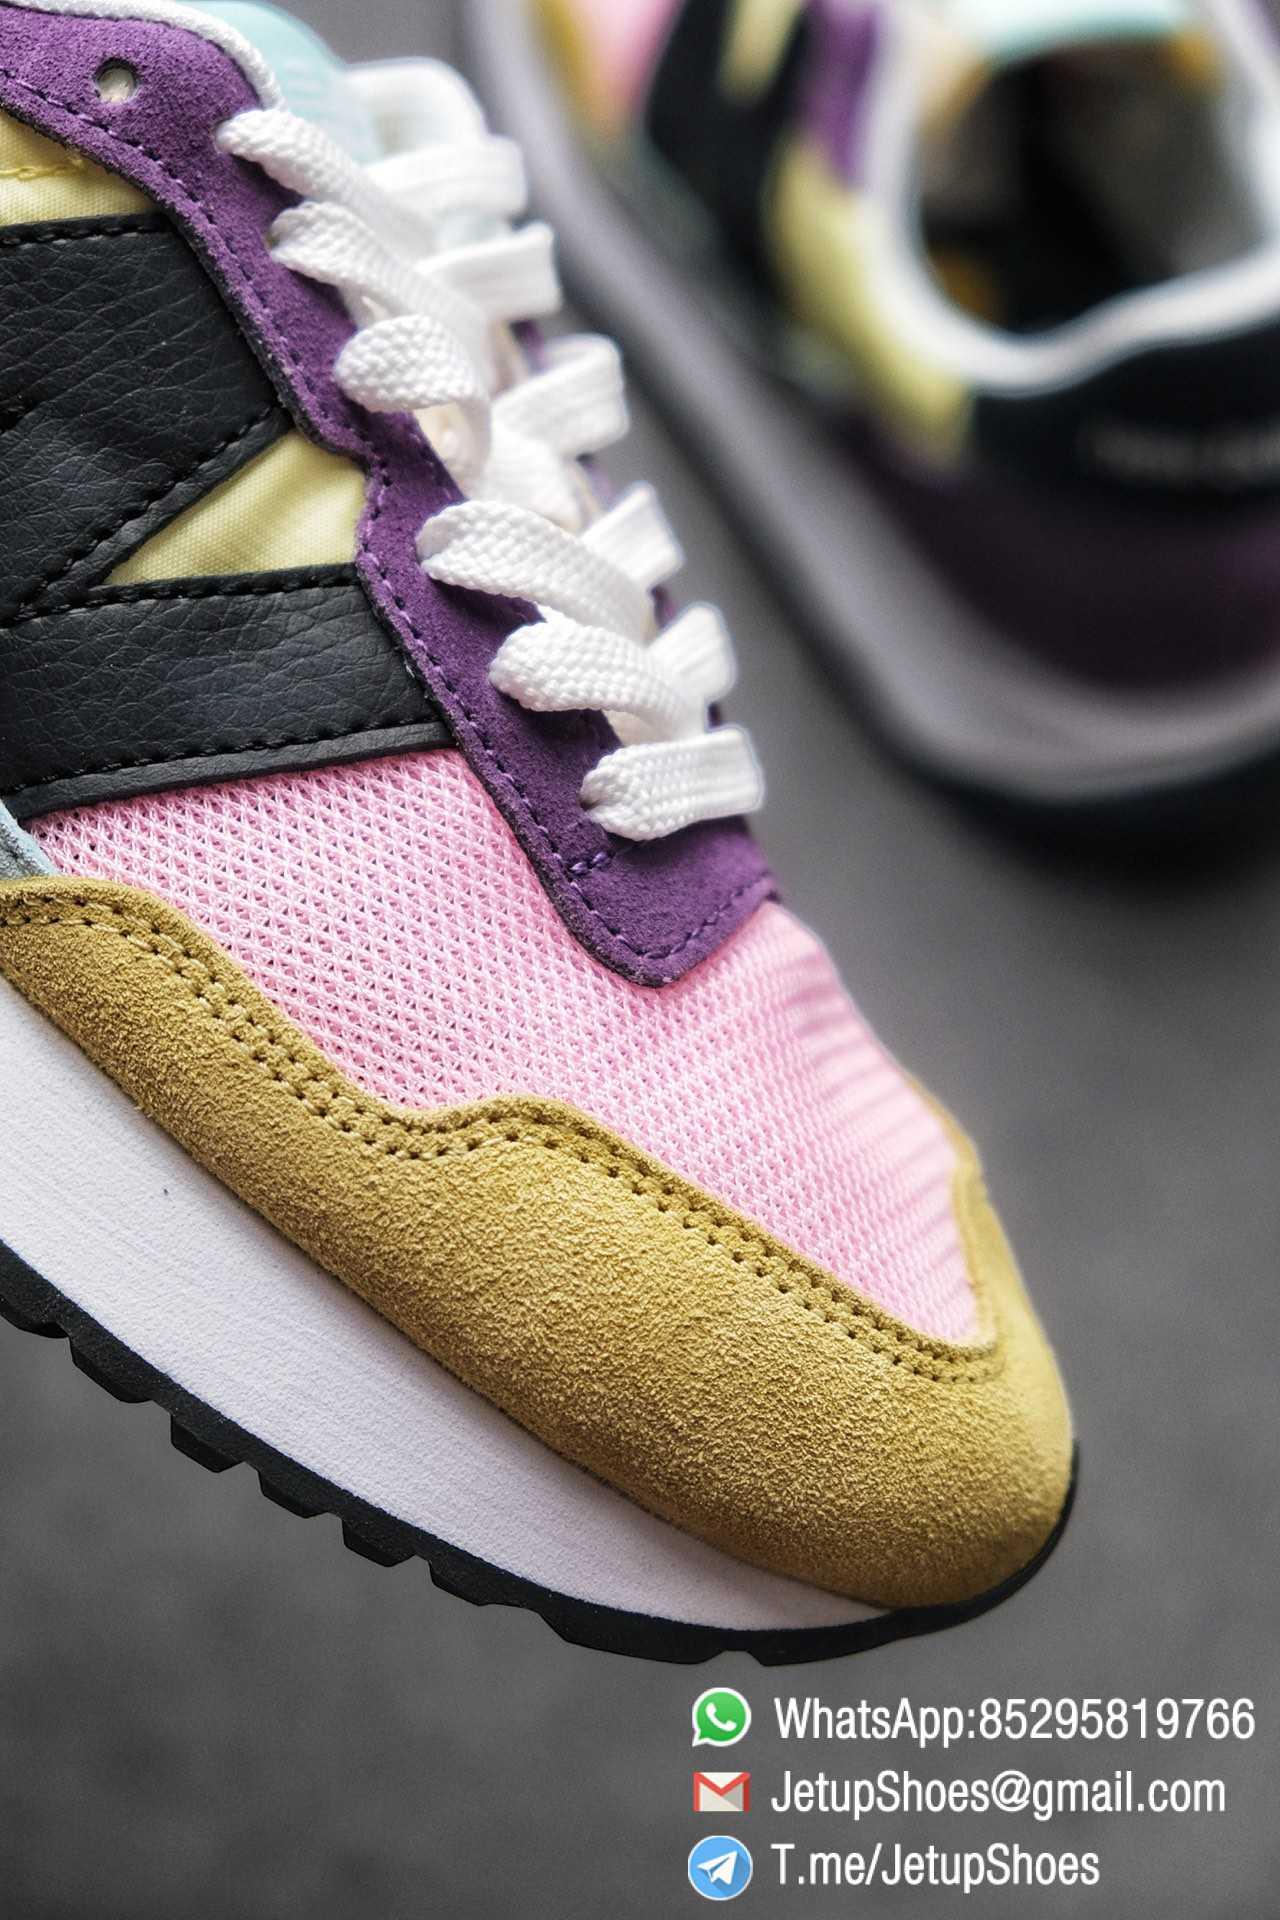 Best Replica 2021 New Balance 237 Yellow Purple Pink SKU MS237LB3 High Quality Running Shoes 07